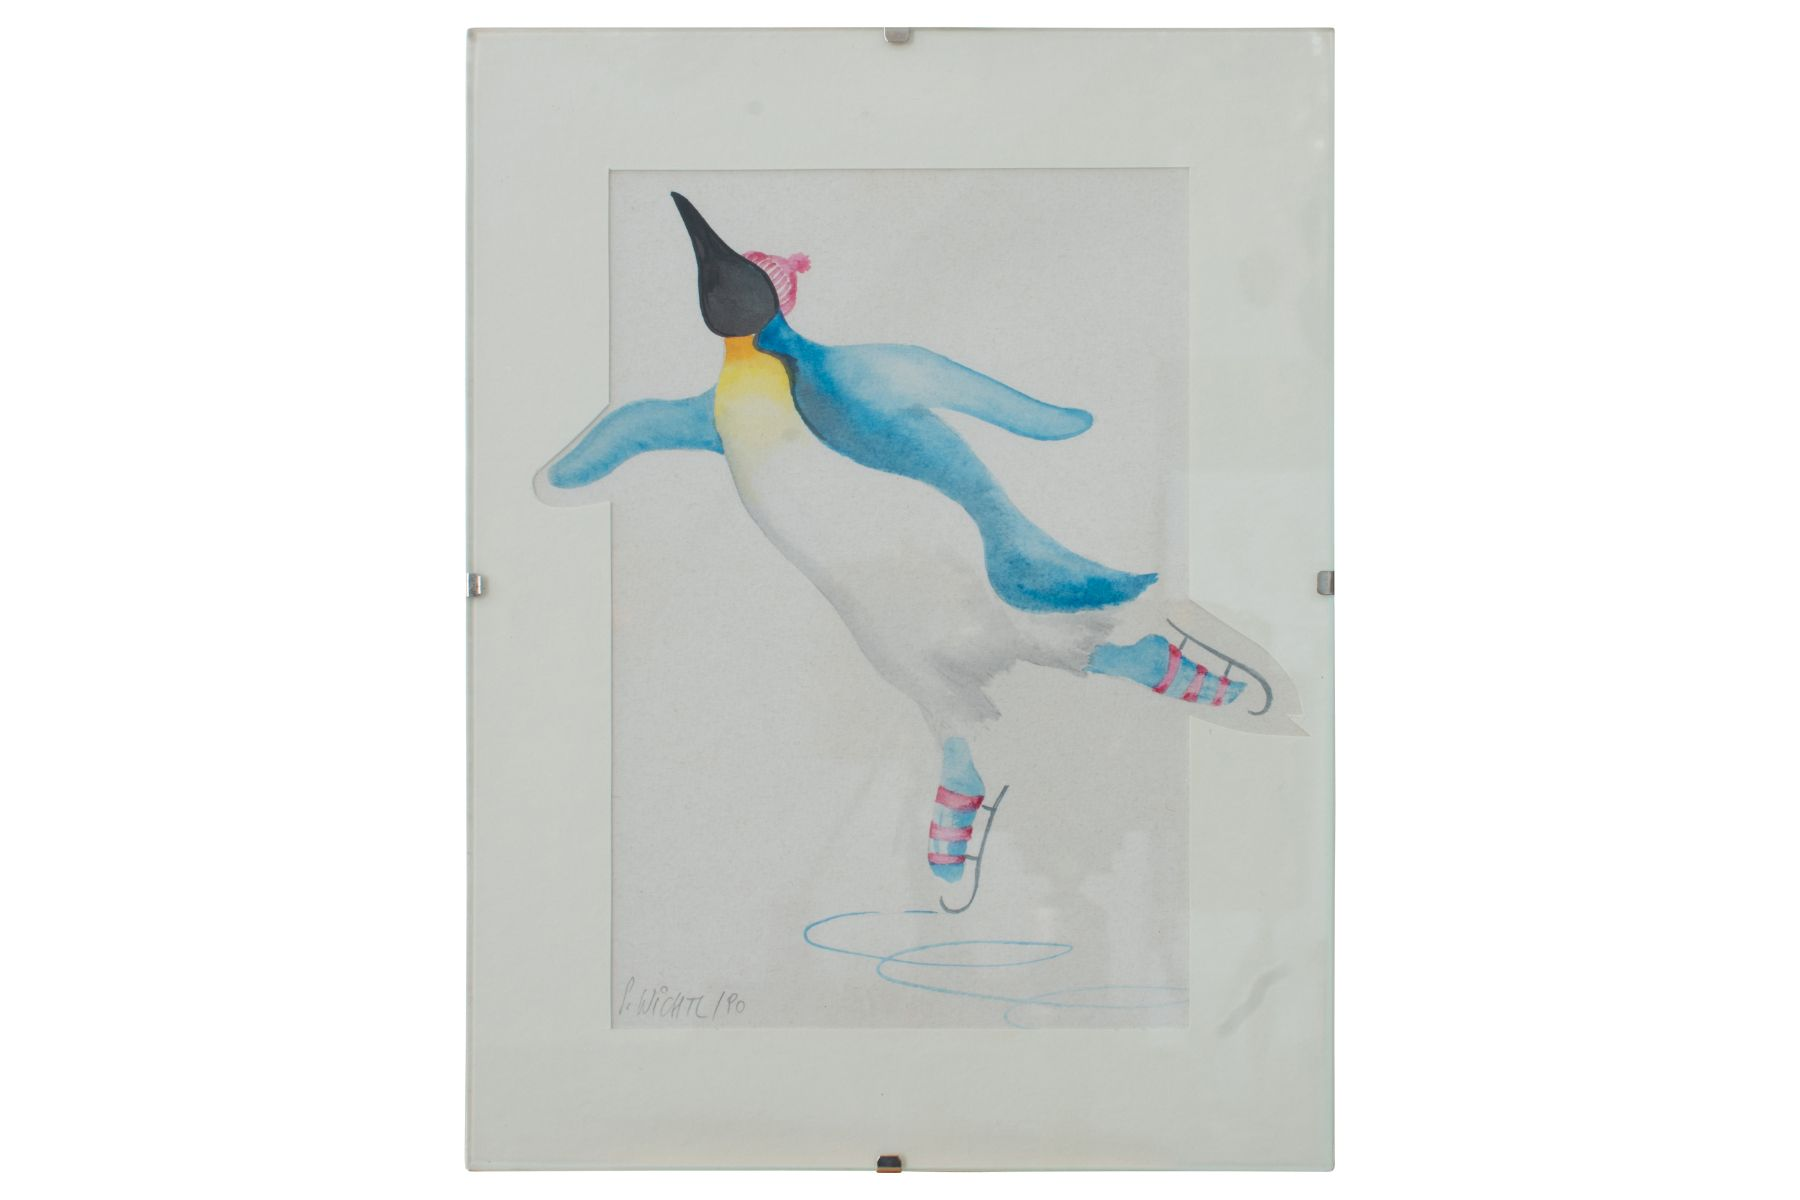 "#86 Silvia Wichtl( 1945) "" Ice dancing penguin"" | Silvia Wichtl (1945) ""Eistanzender Pinguin"" Image"